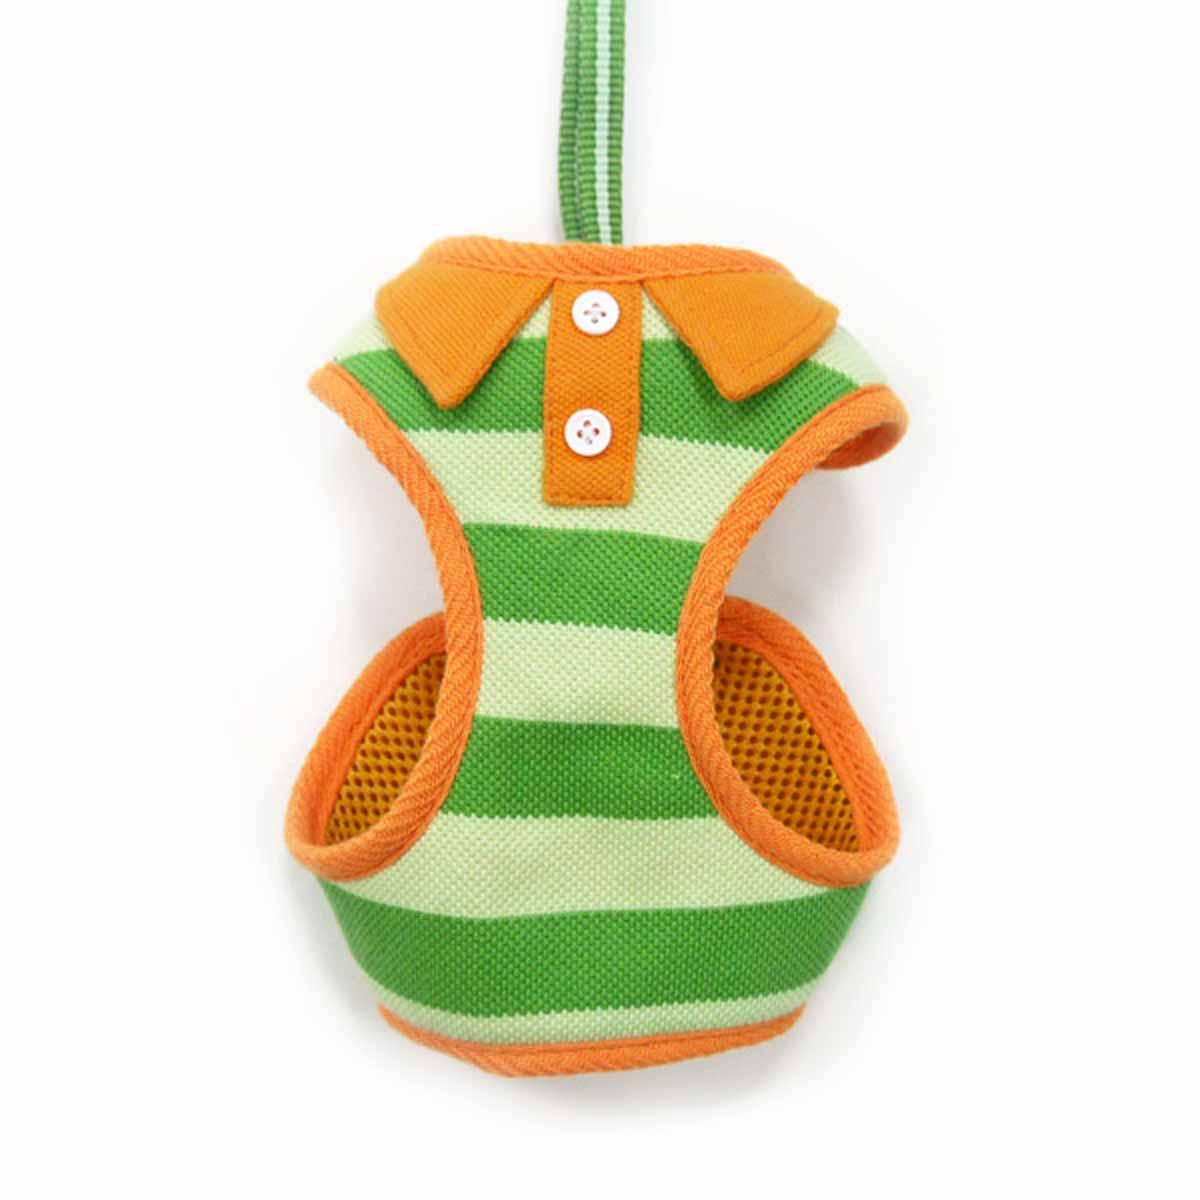 EasyGo Polo Stripe Dog Harness by Dogo - Green